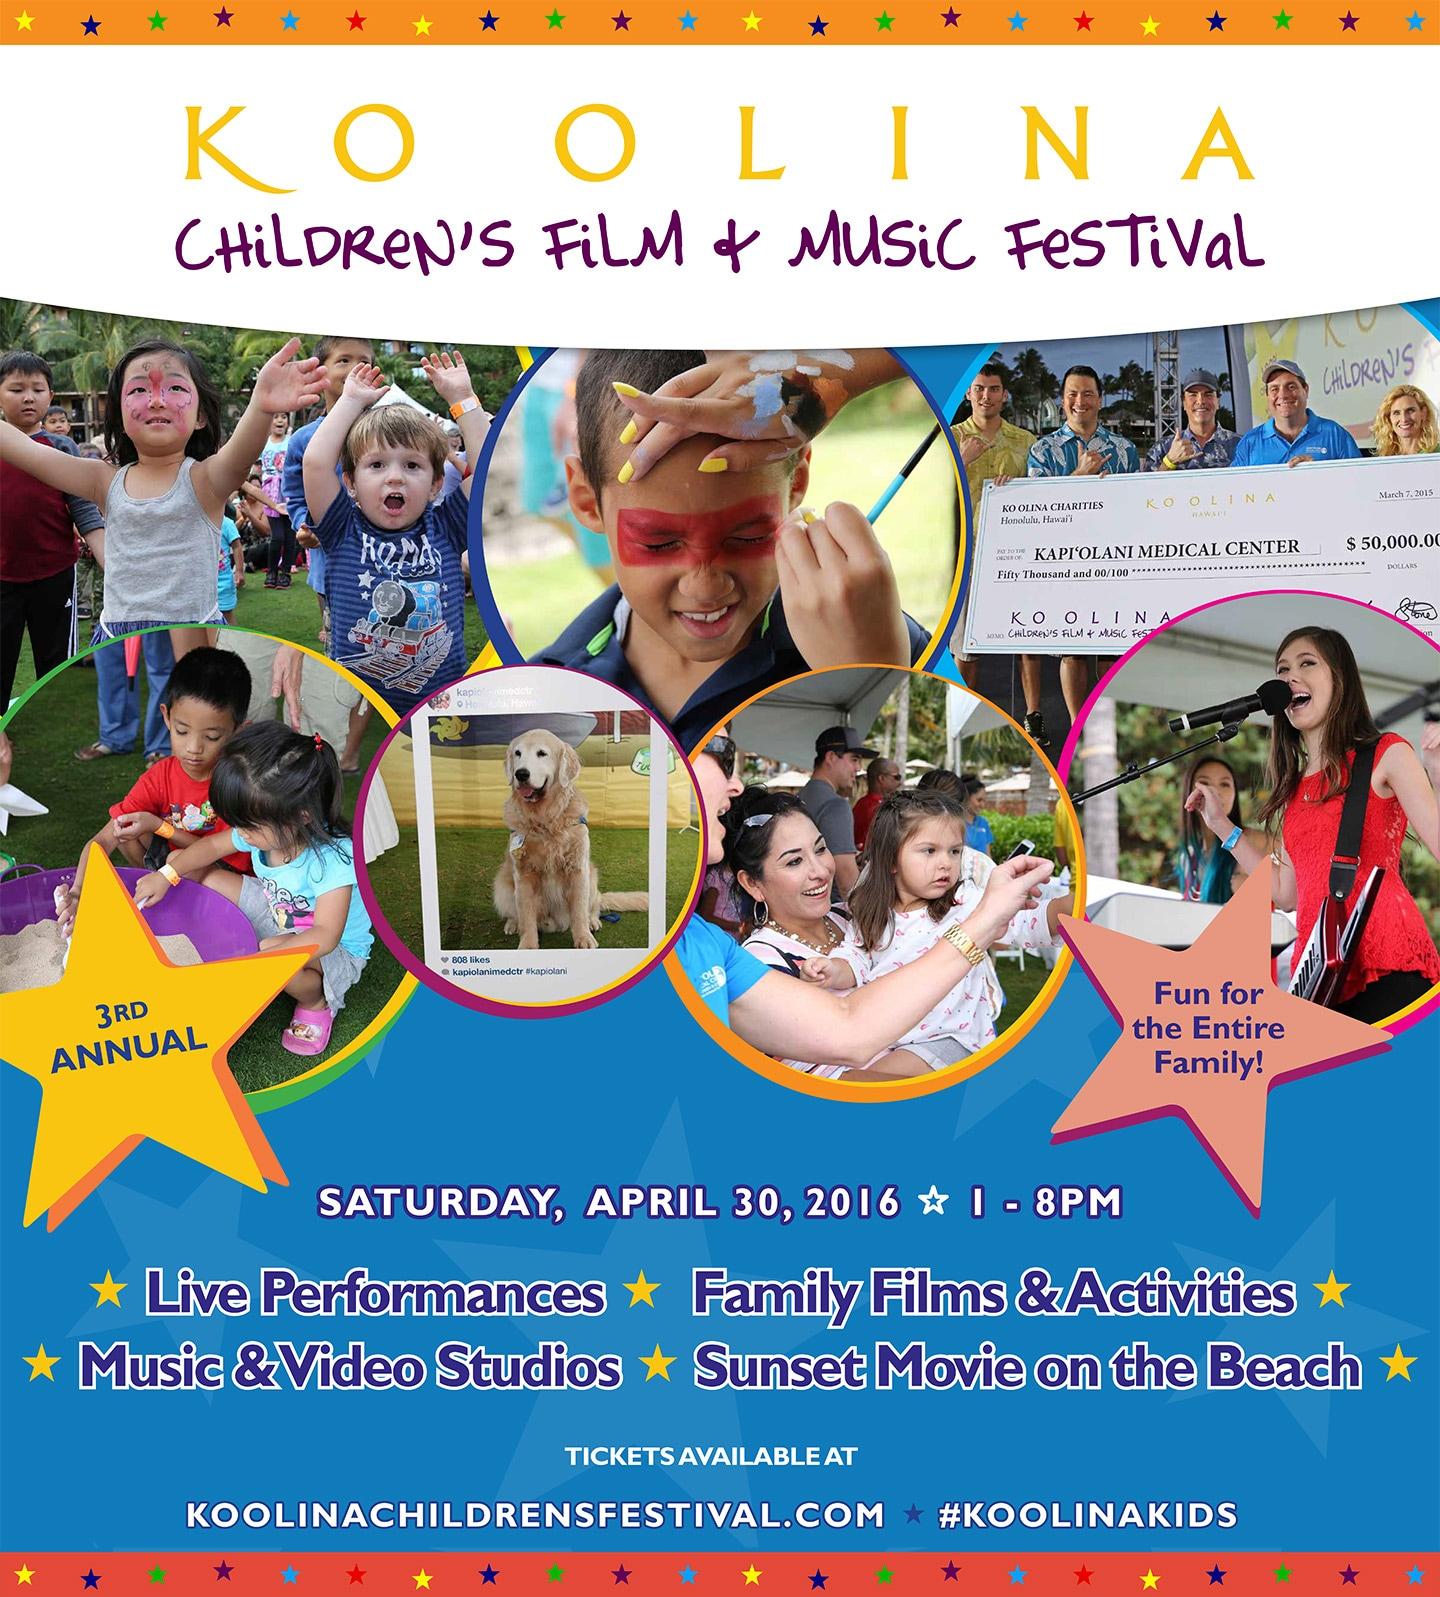 Aulani, a Disney Resort & Spa Welcomes the Ko Olina Children's Film & Music Festival